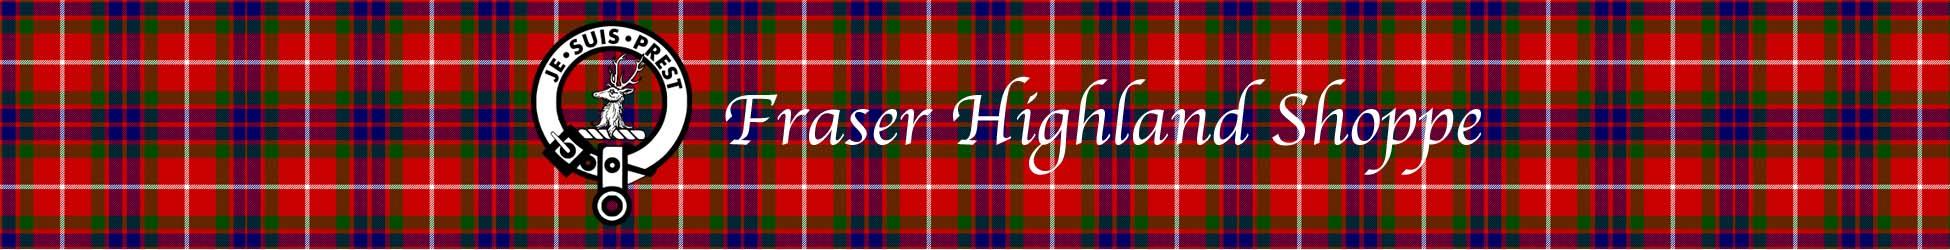 Fraser Highland Shoppe Coupons & Promo codes